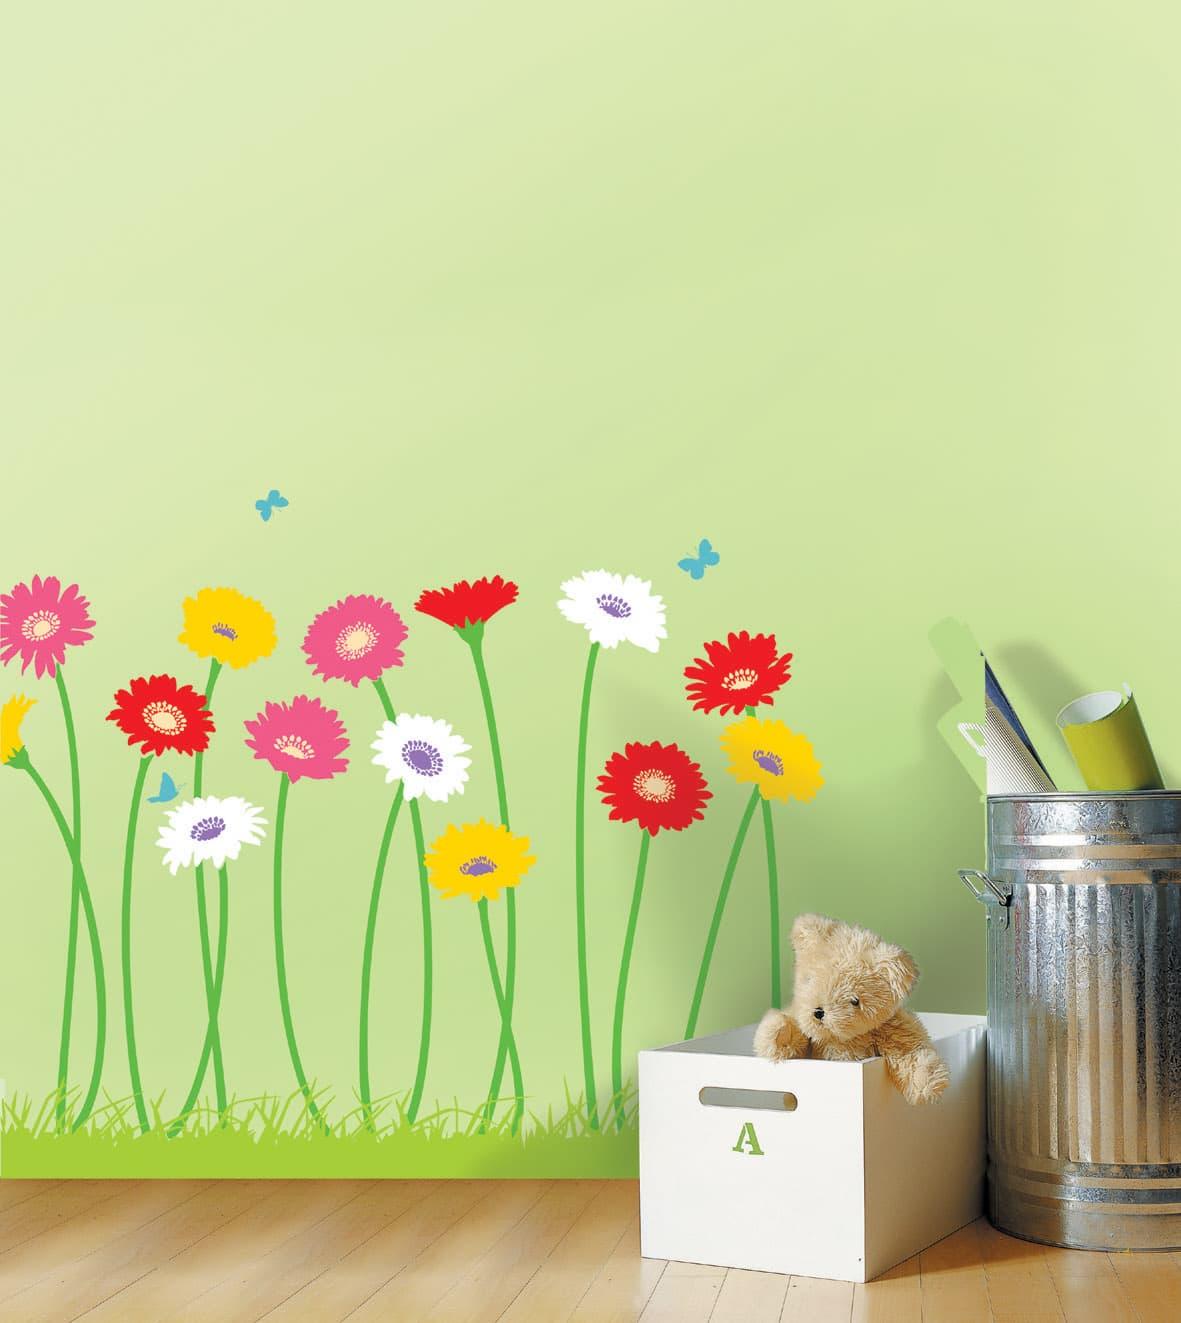 Kita self adhesive wall art decor sticker kr 0024 from kr for Decor international wholesale